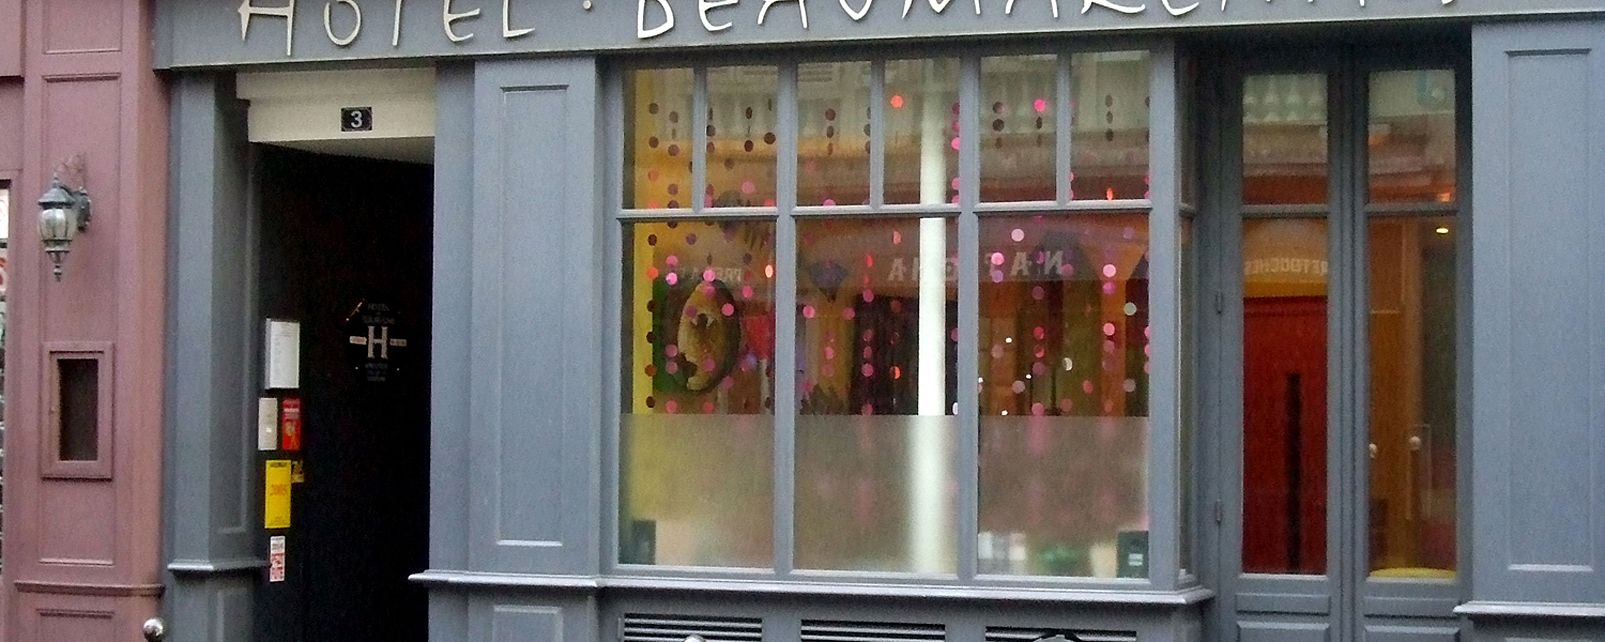 Hotel Exclusive Beaumarchais Marais